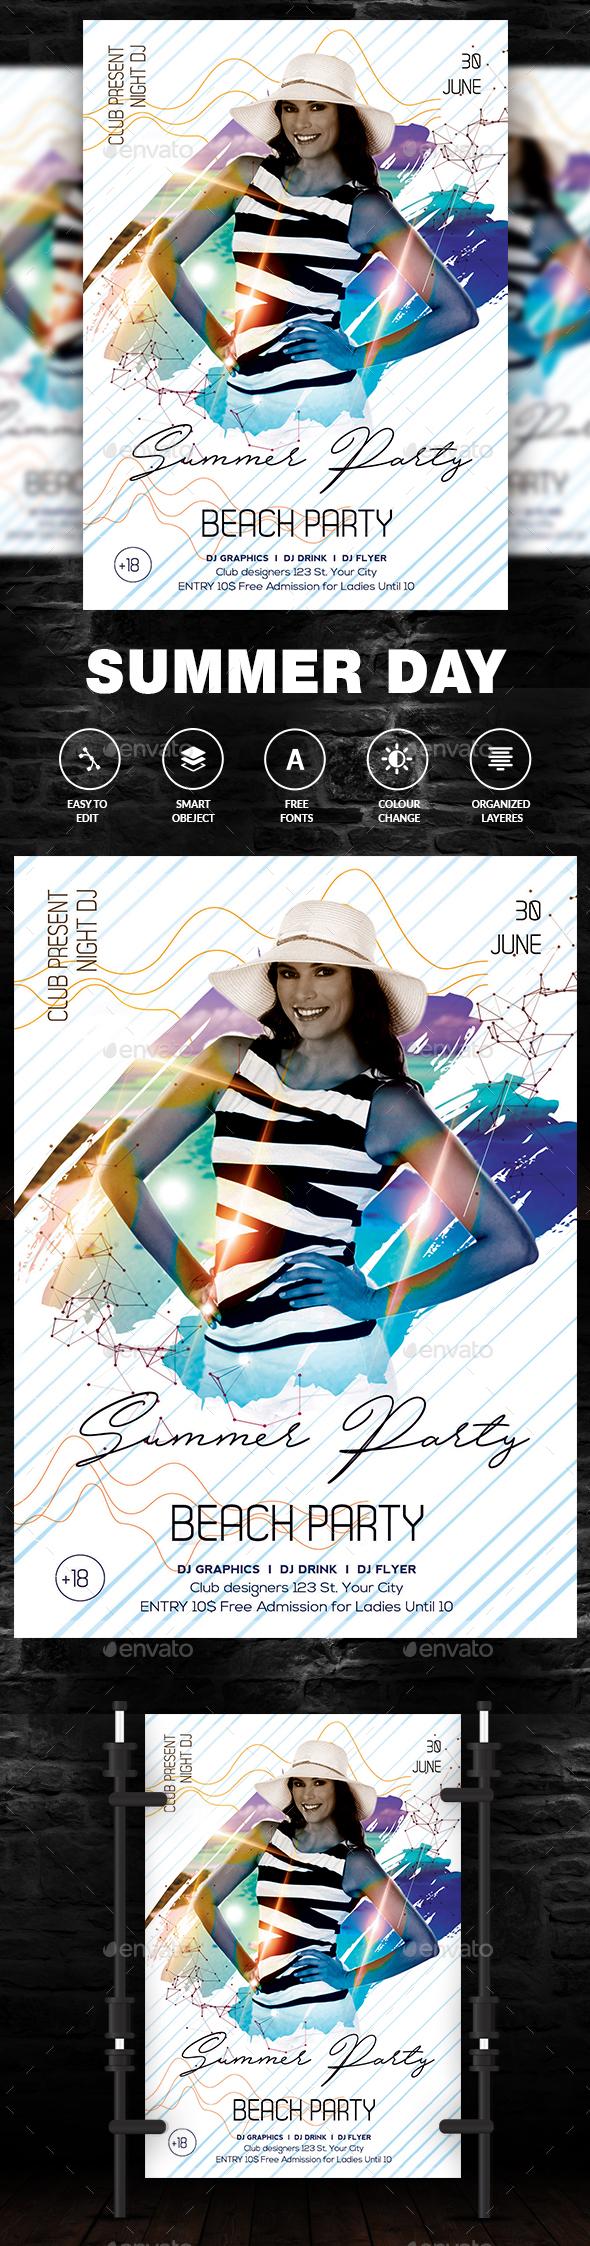 Summer Artist Event Flyer/Poster - Events Flyers